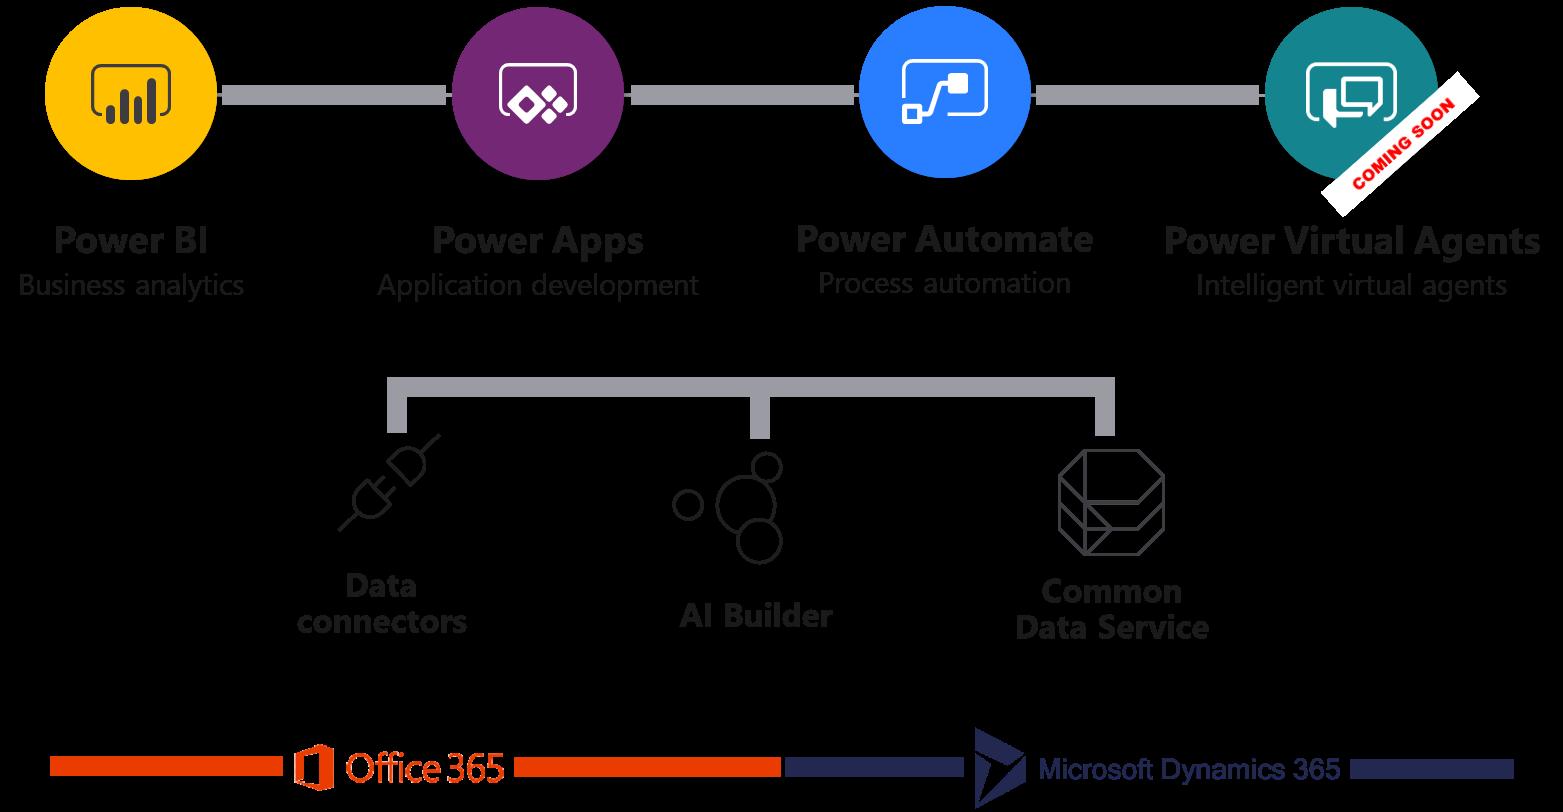 power-platform-diagram-info